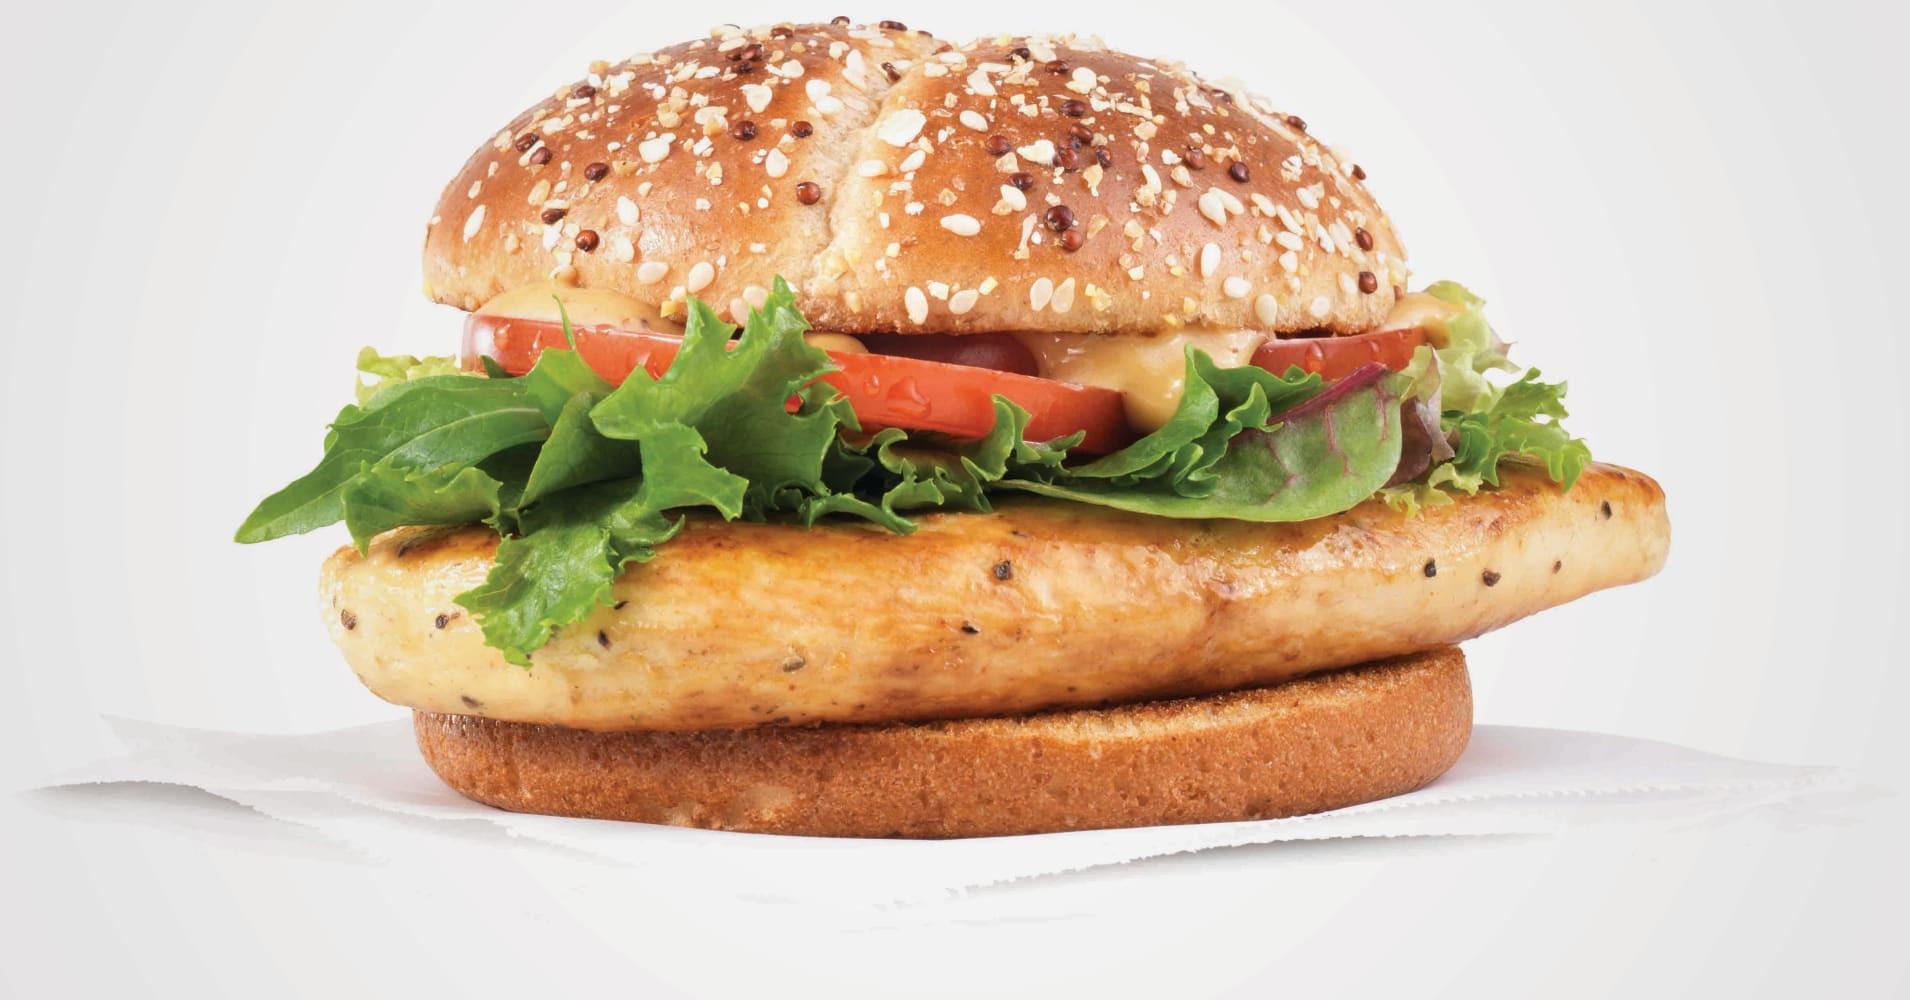 Wendys Chicken Sandwiches  Restaurant chains double down on chicken to boost foot traffic